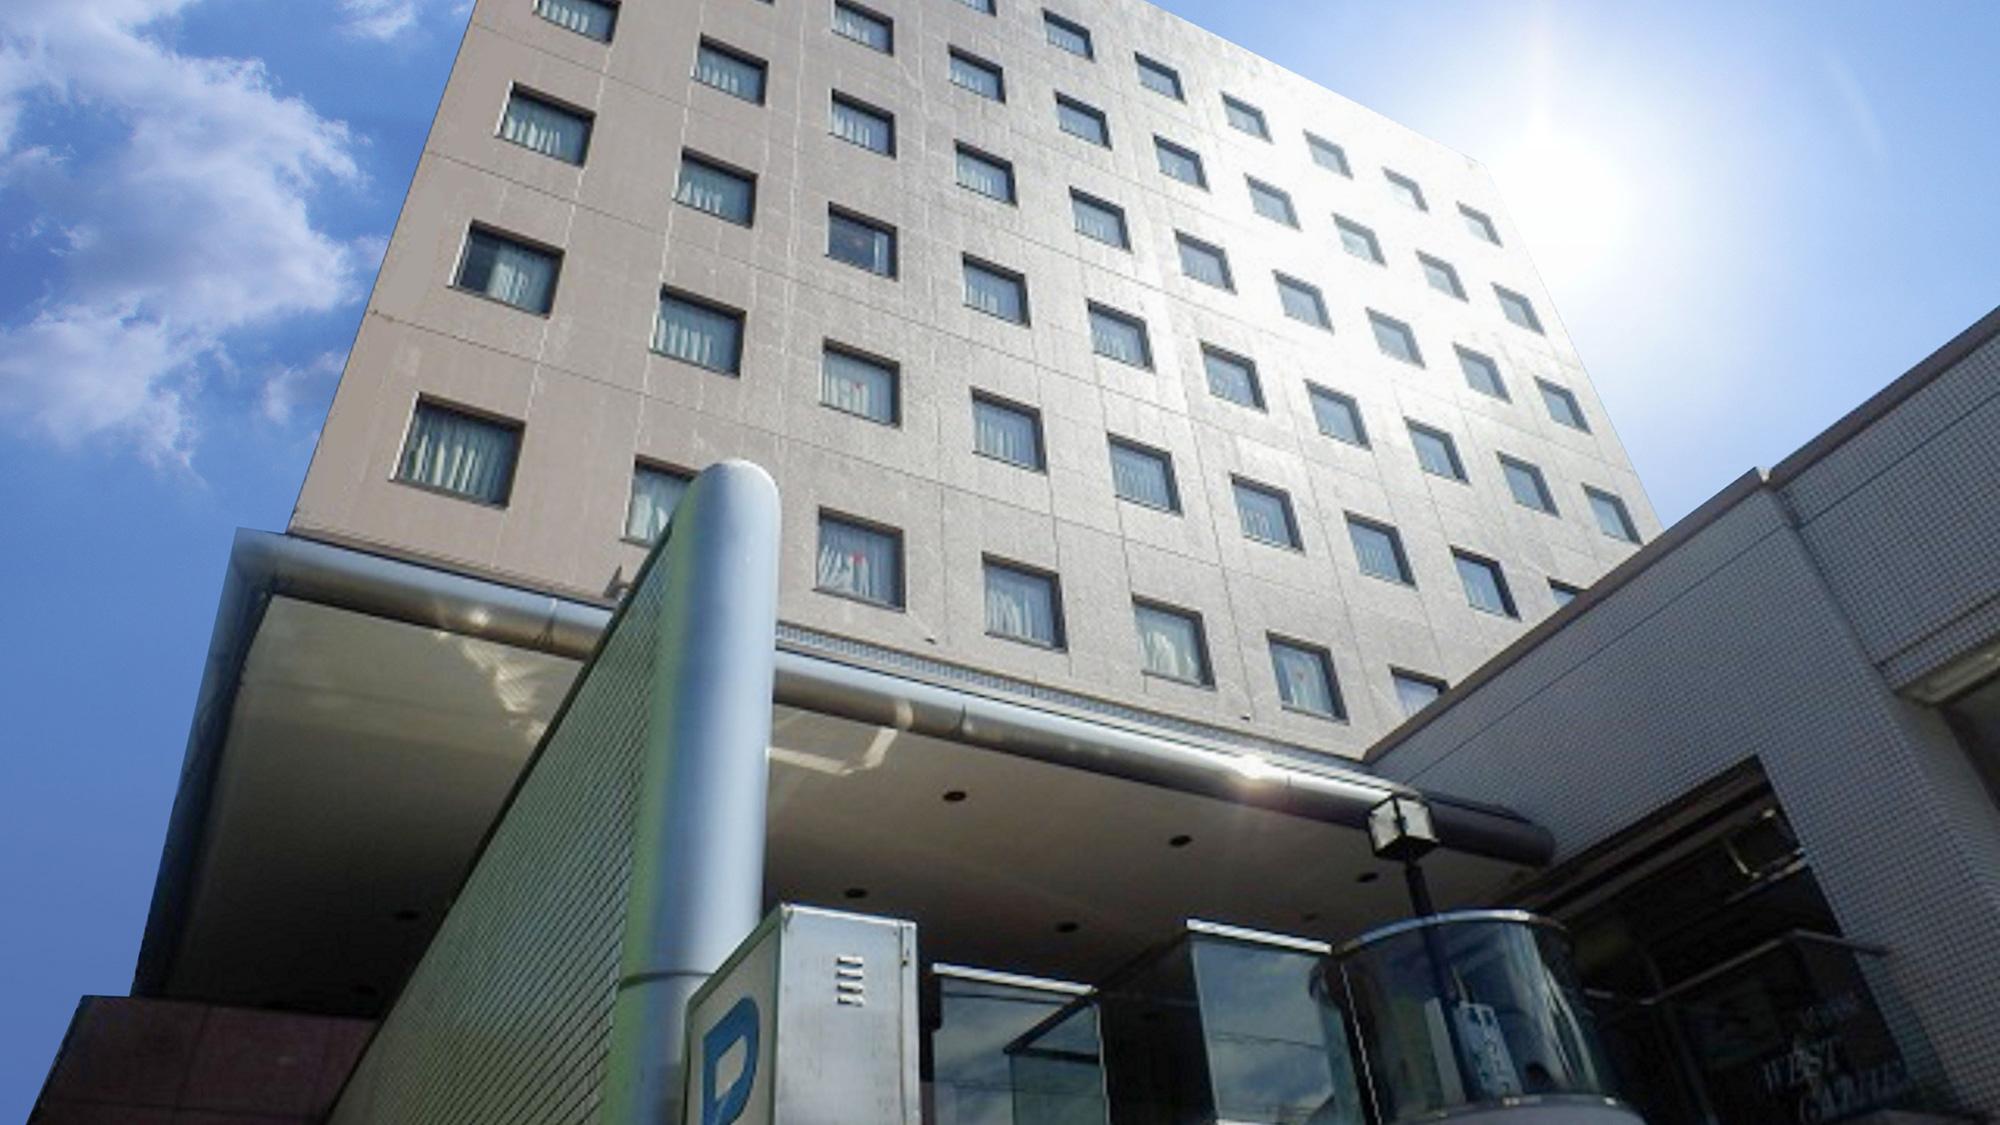 97890930fbf8c 富士宮シティホテルJR身延線の西富士宮駅前、ビジネスにも観光にも至便の当館で、ゆとりと寛ぎのステイをお楽しみ下さい。